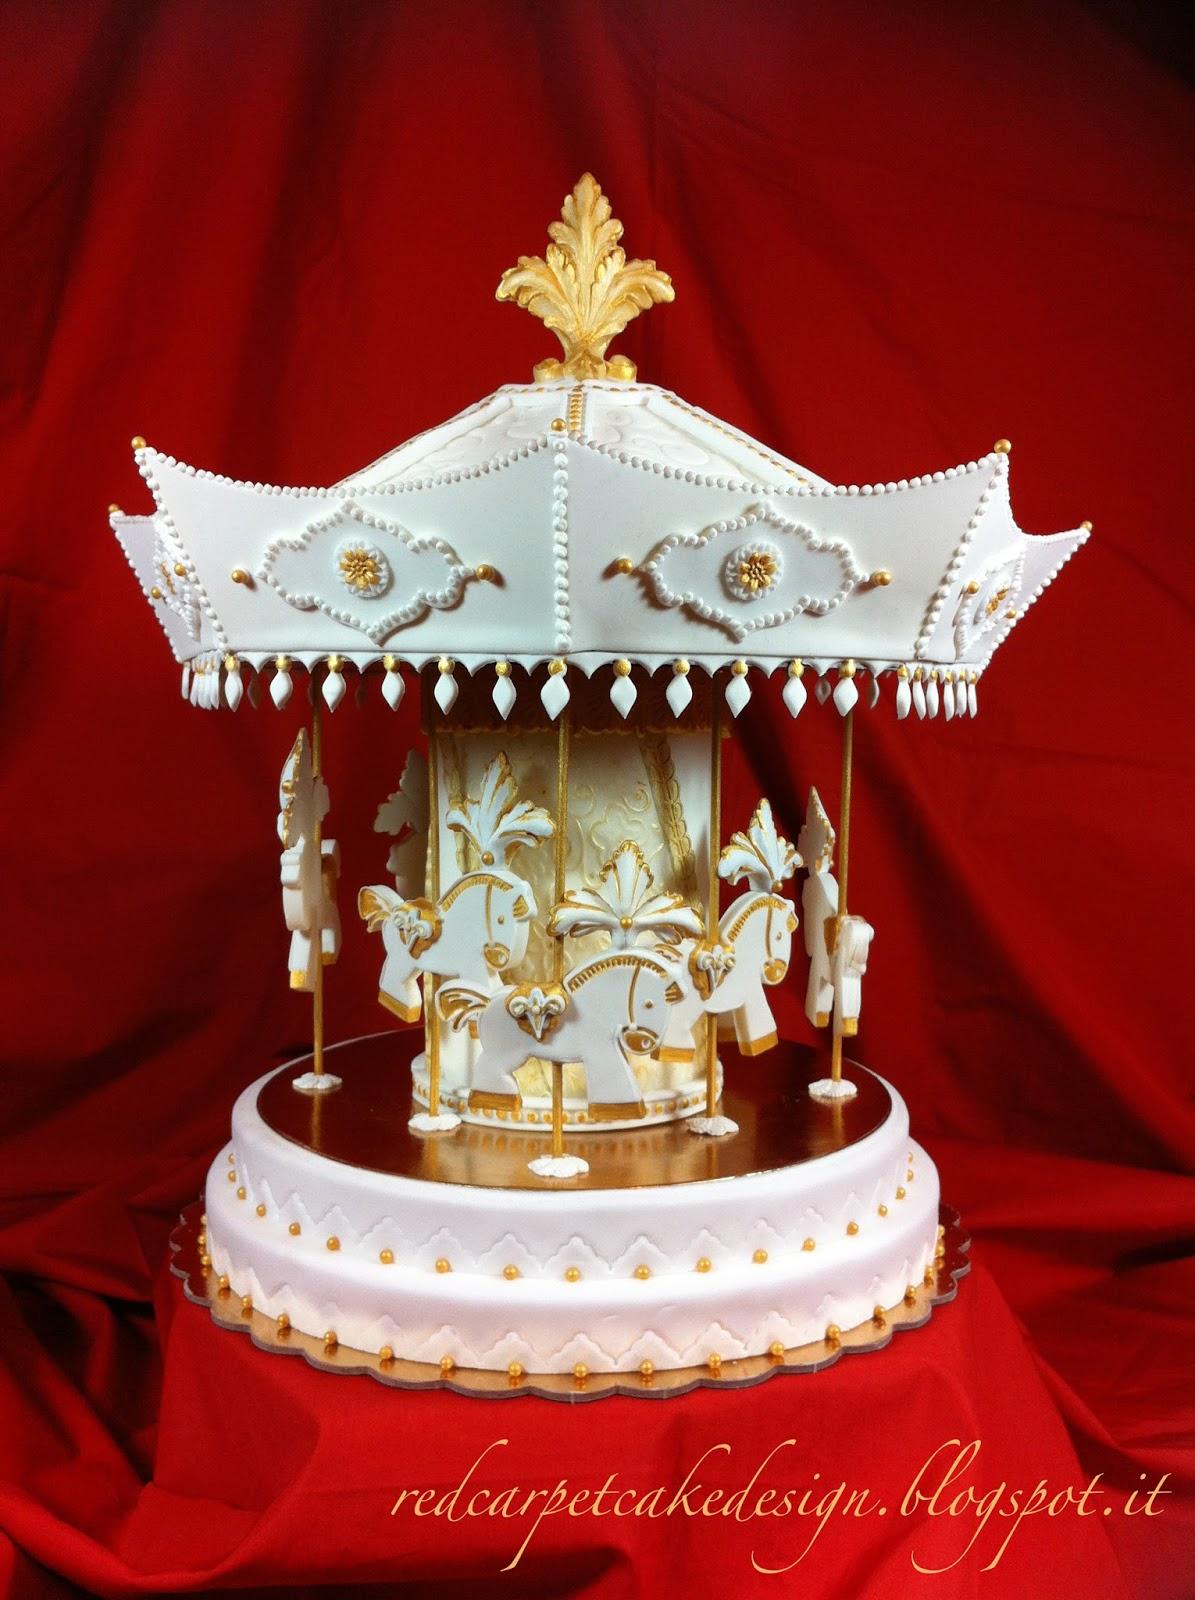 Red Carpet Cake Design®: CAROUSEL CAKE- pubblicato in Cucina ...